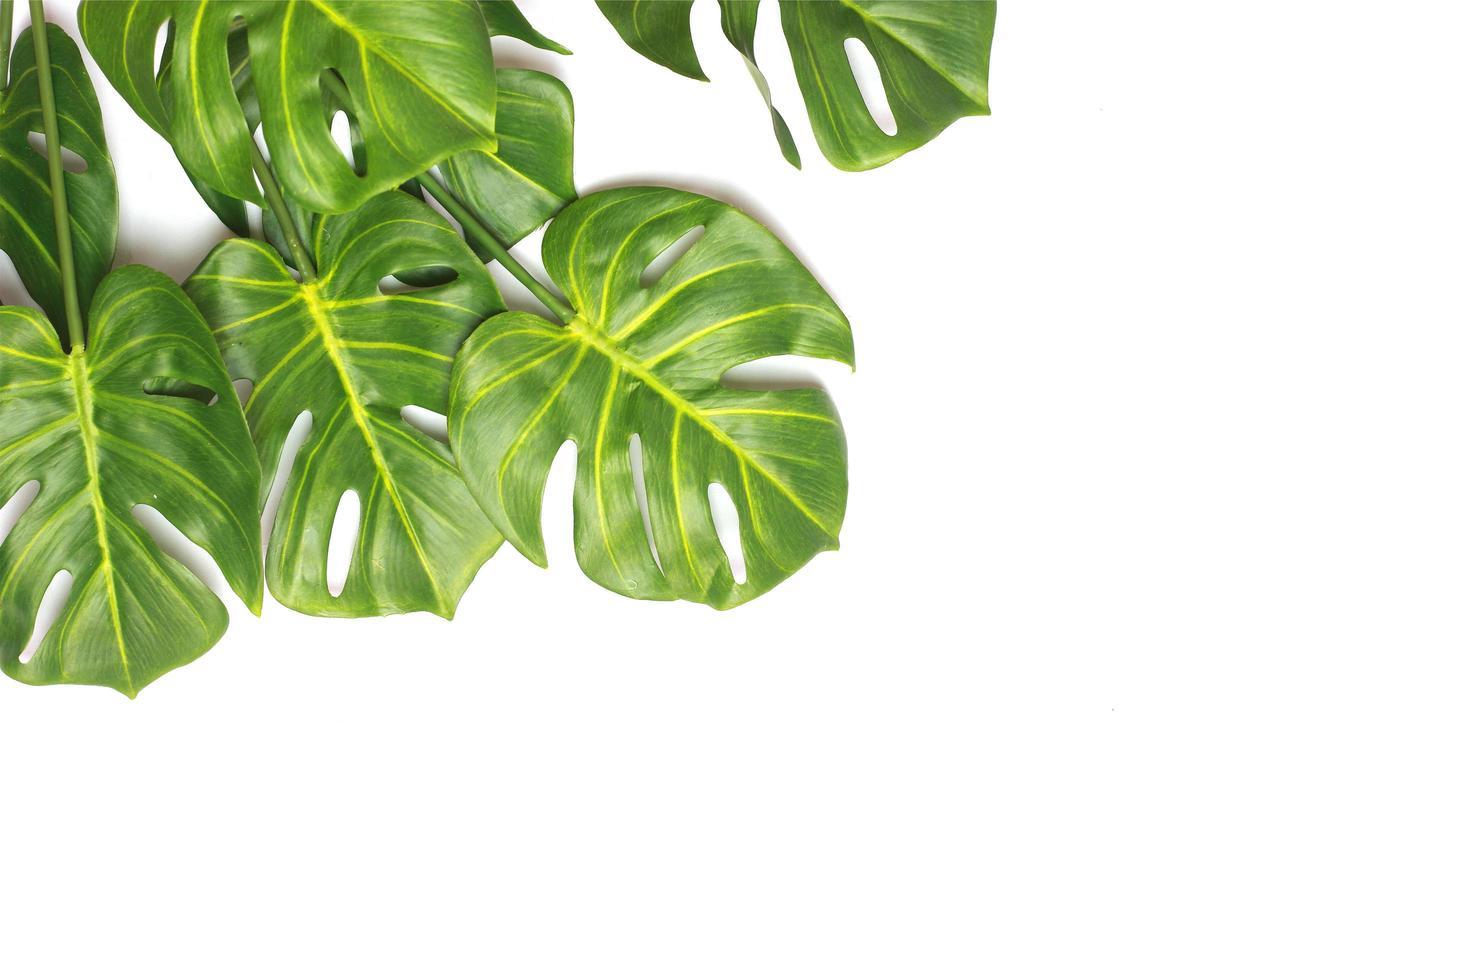 Monstera palm leaf flat lay photo